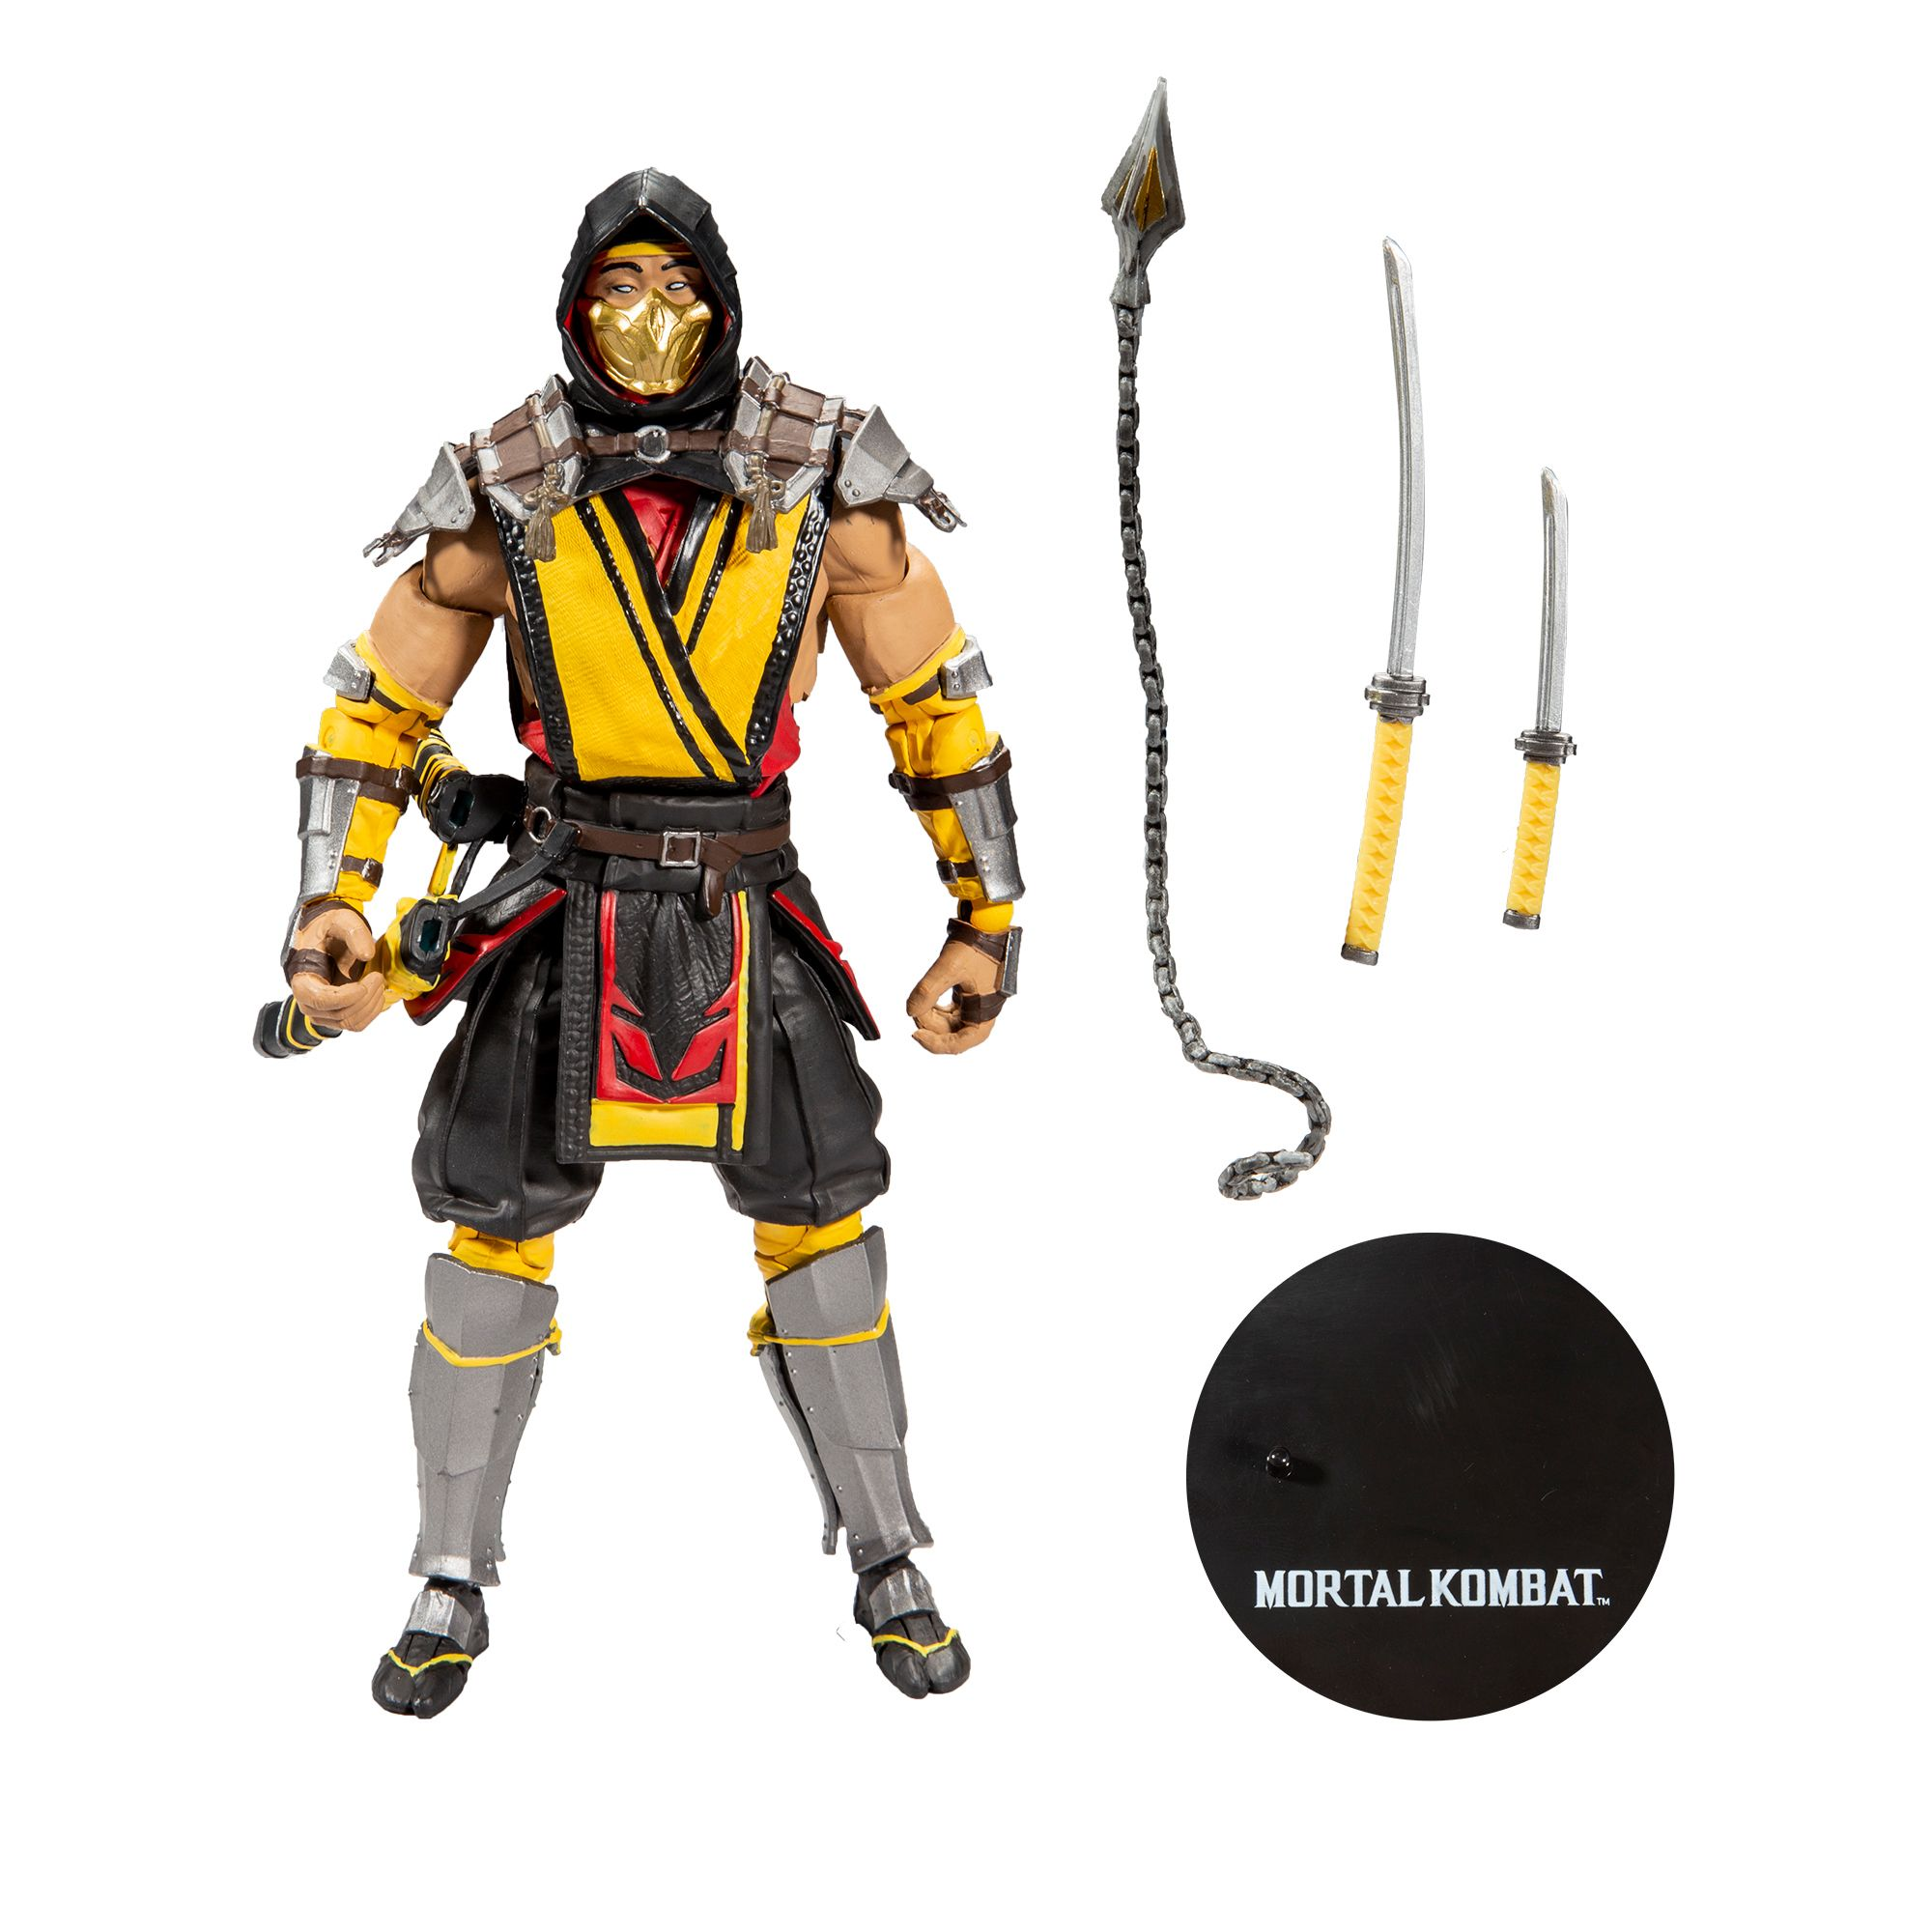 Scorpion - McFarlane Mortal Kombat 11 Action Figure